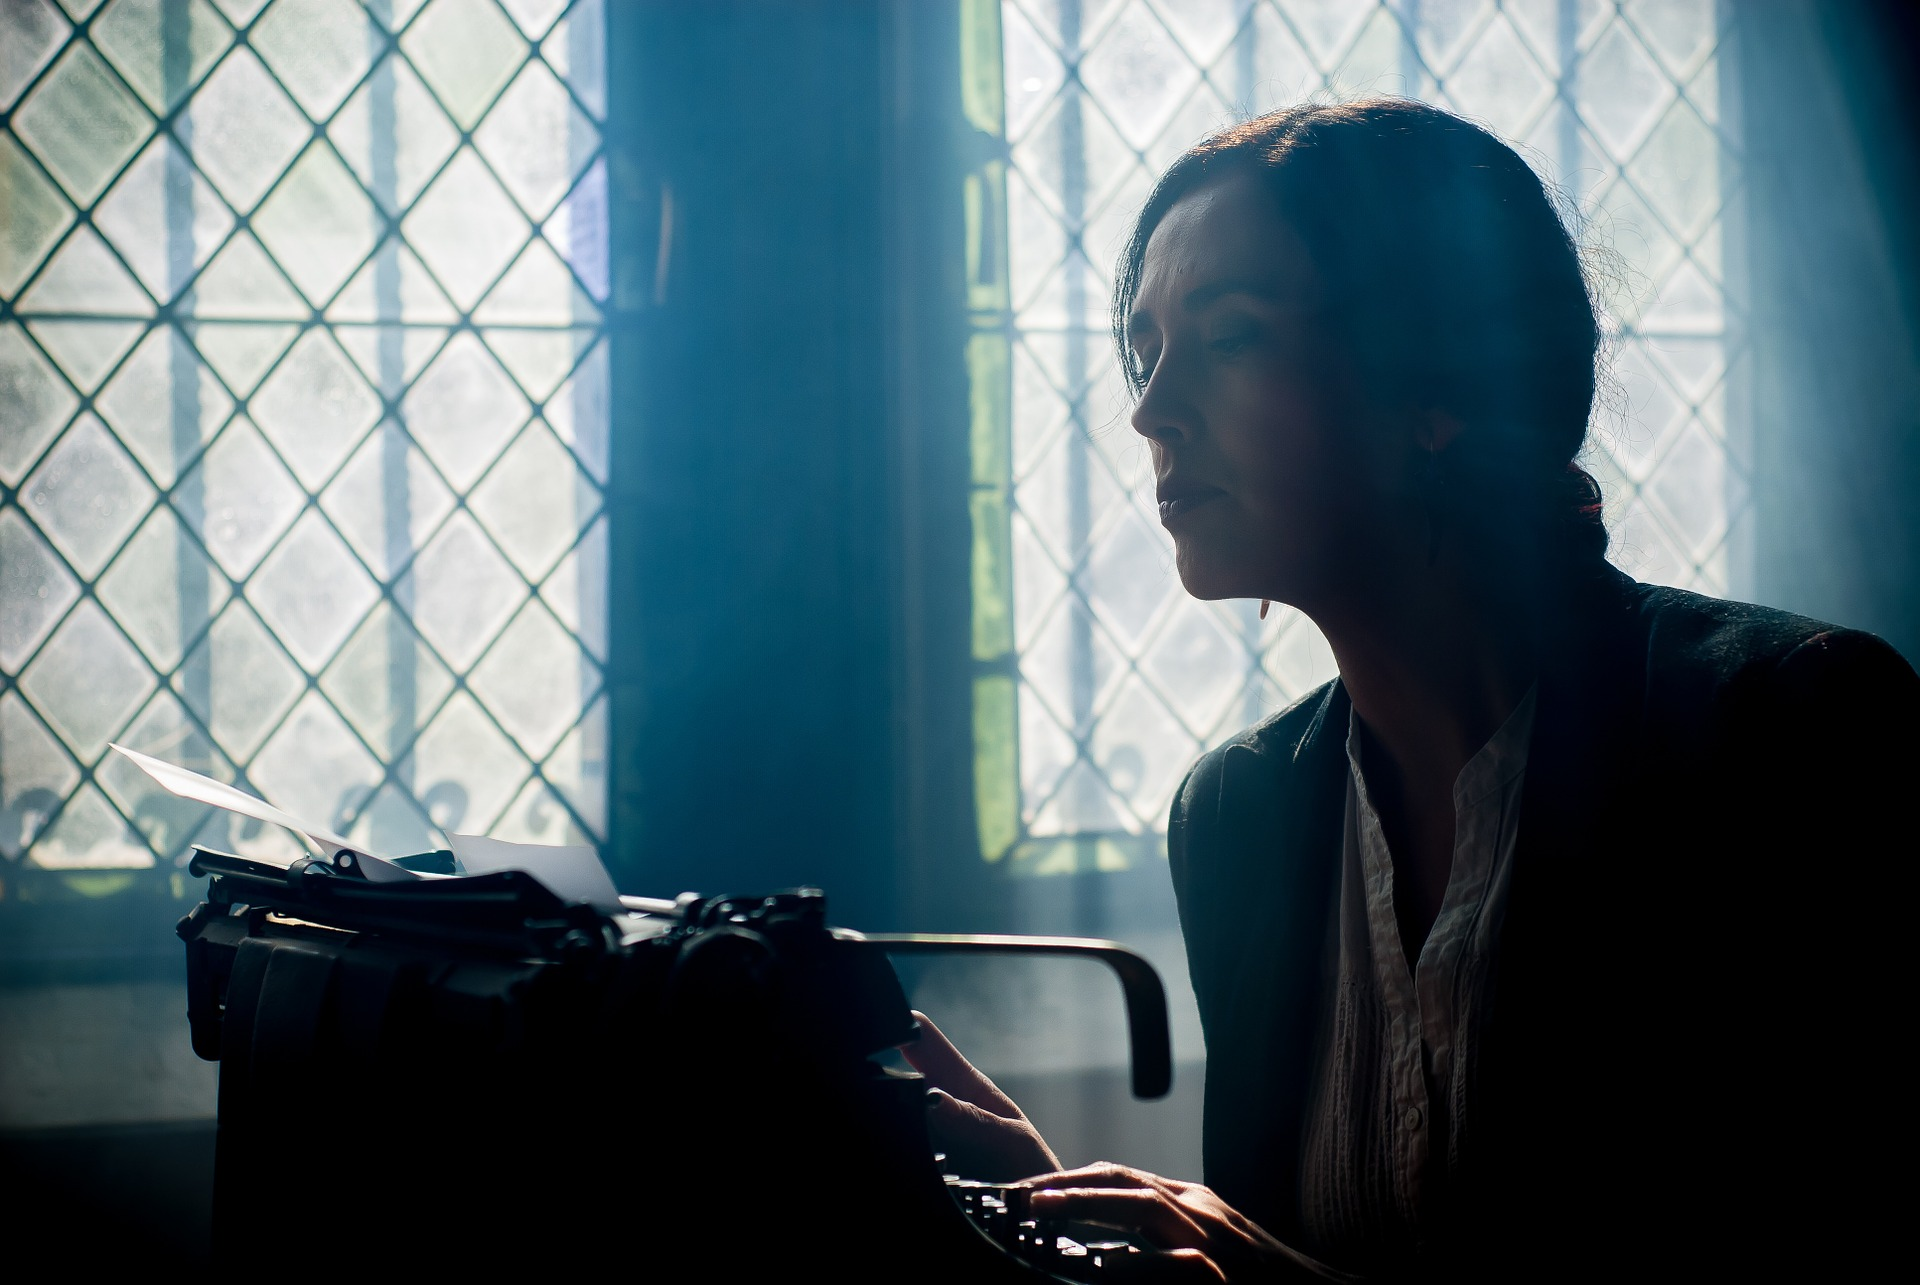 Žena pisac/Photo: Pixabay